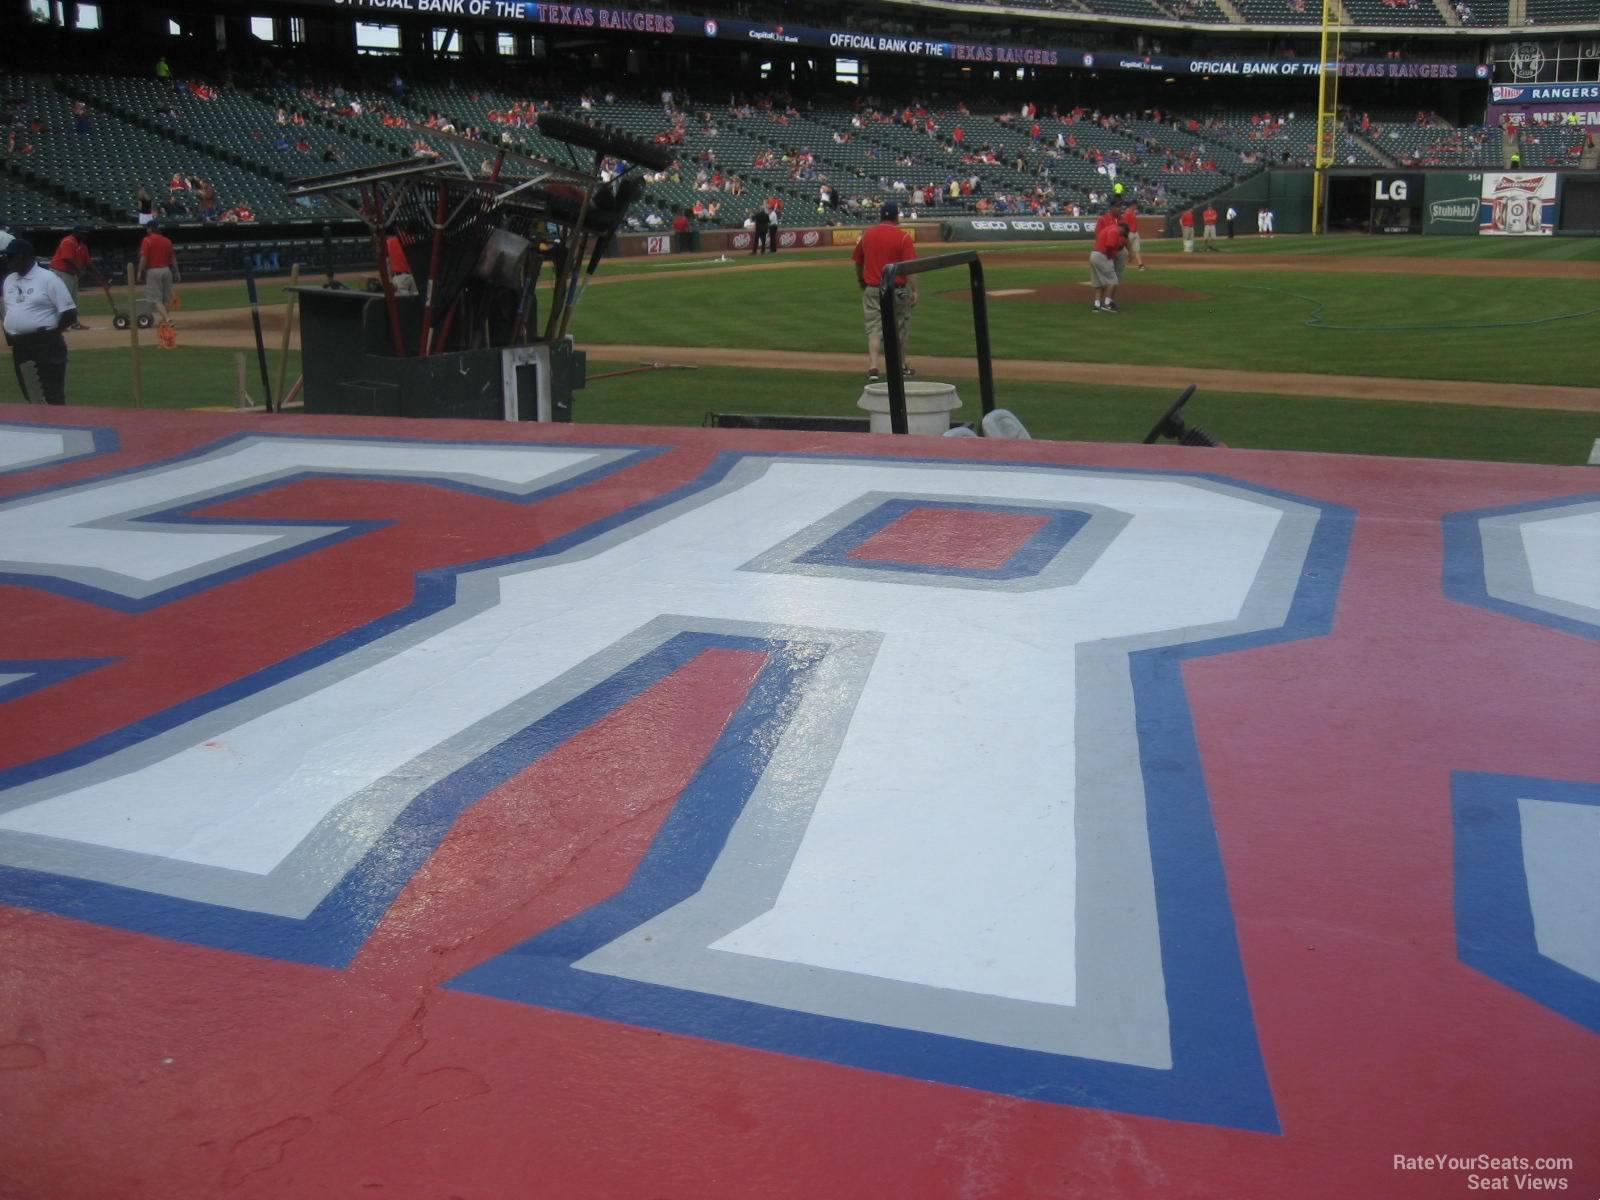 Rangers Ballpark Section 33 Row 4 Seat 12 4 on 4 18 2014k